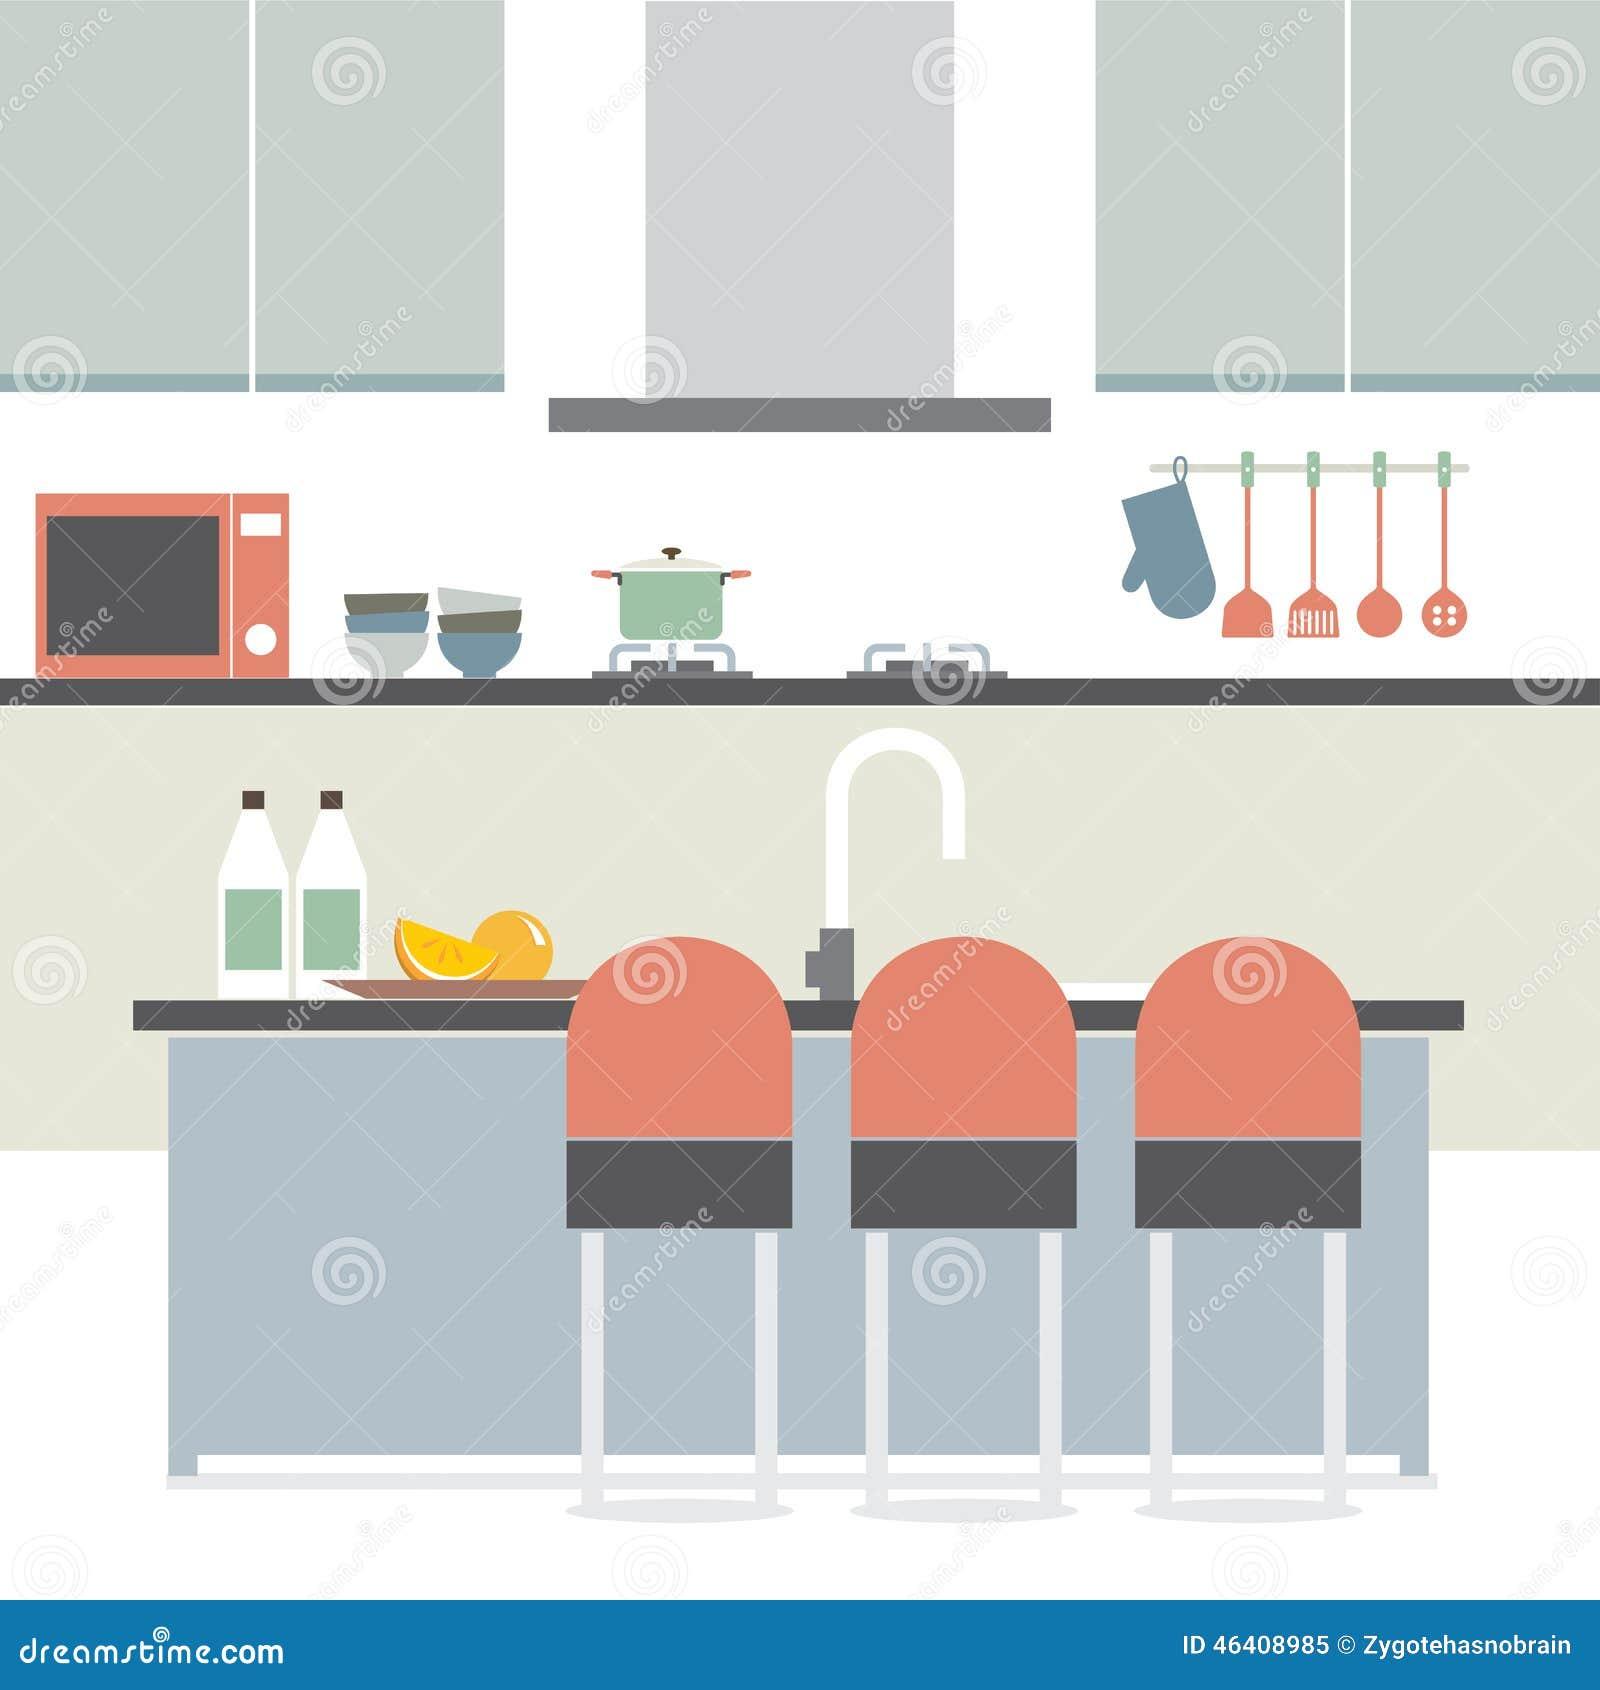 Modern Flat Design Kitchen Interior Stock Vector Illustration Of Room Illustration 46408985